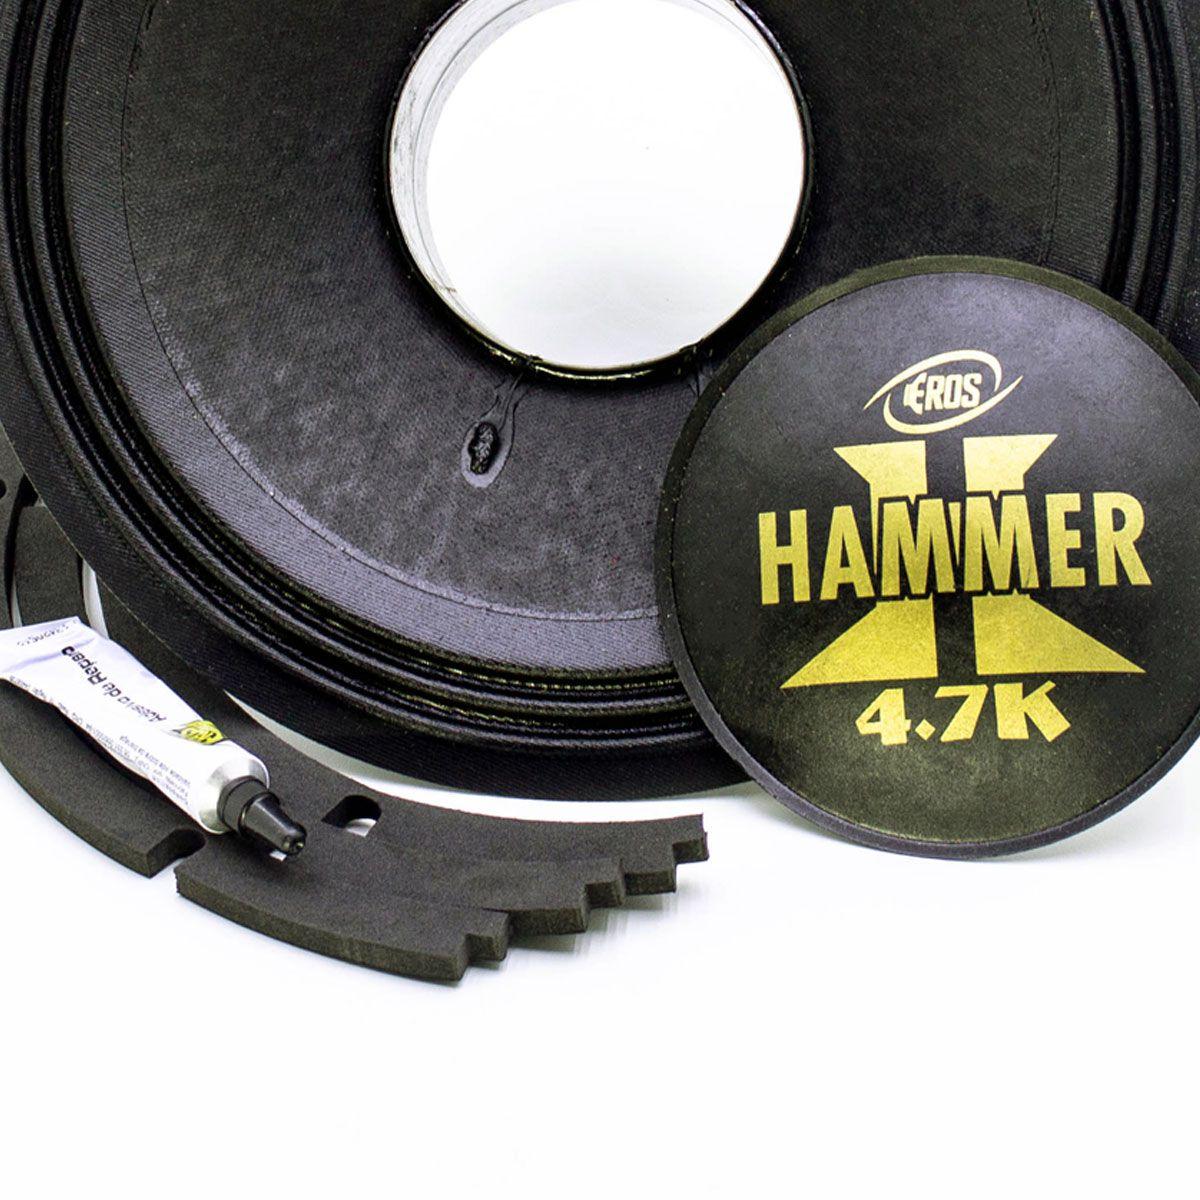 "Kit Reparo para Alto Falante Eros 12"" HAMMER 4.7K 4R 8R"